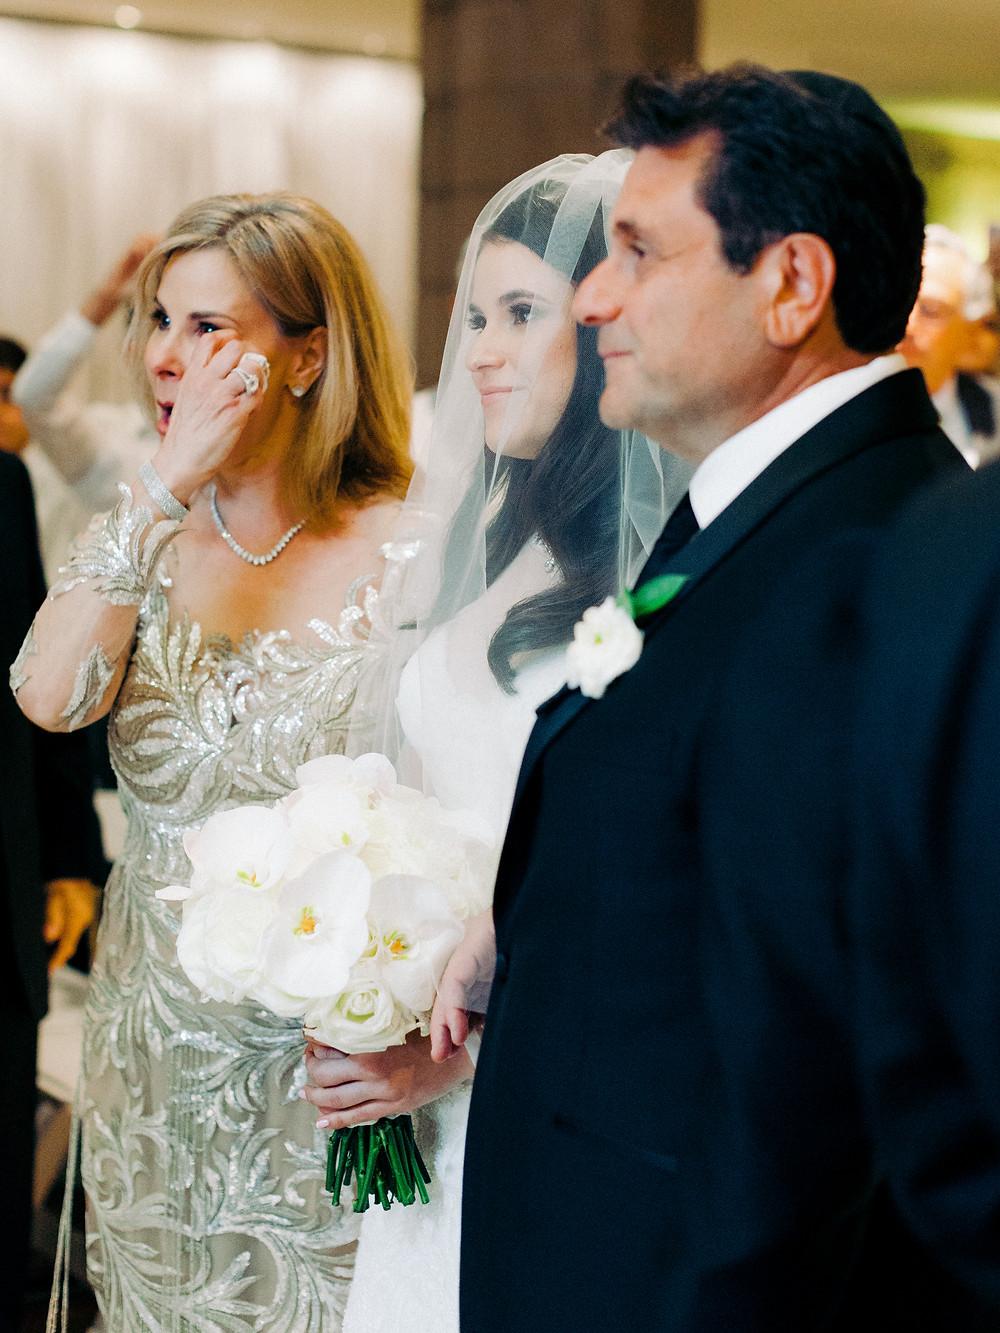 Arizona Biltmore Classic White Wedding, Ceremony